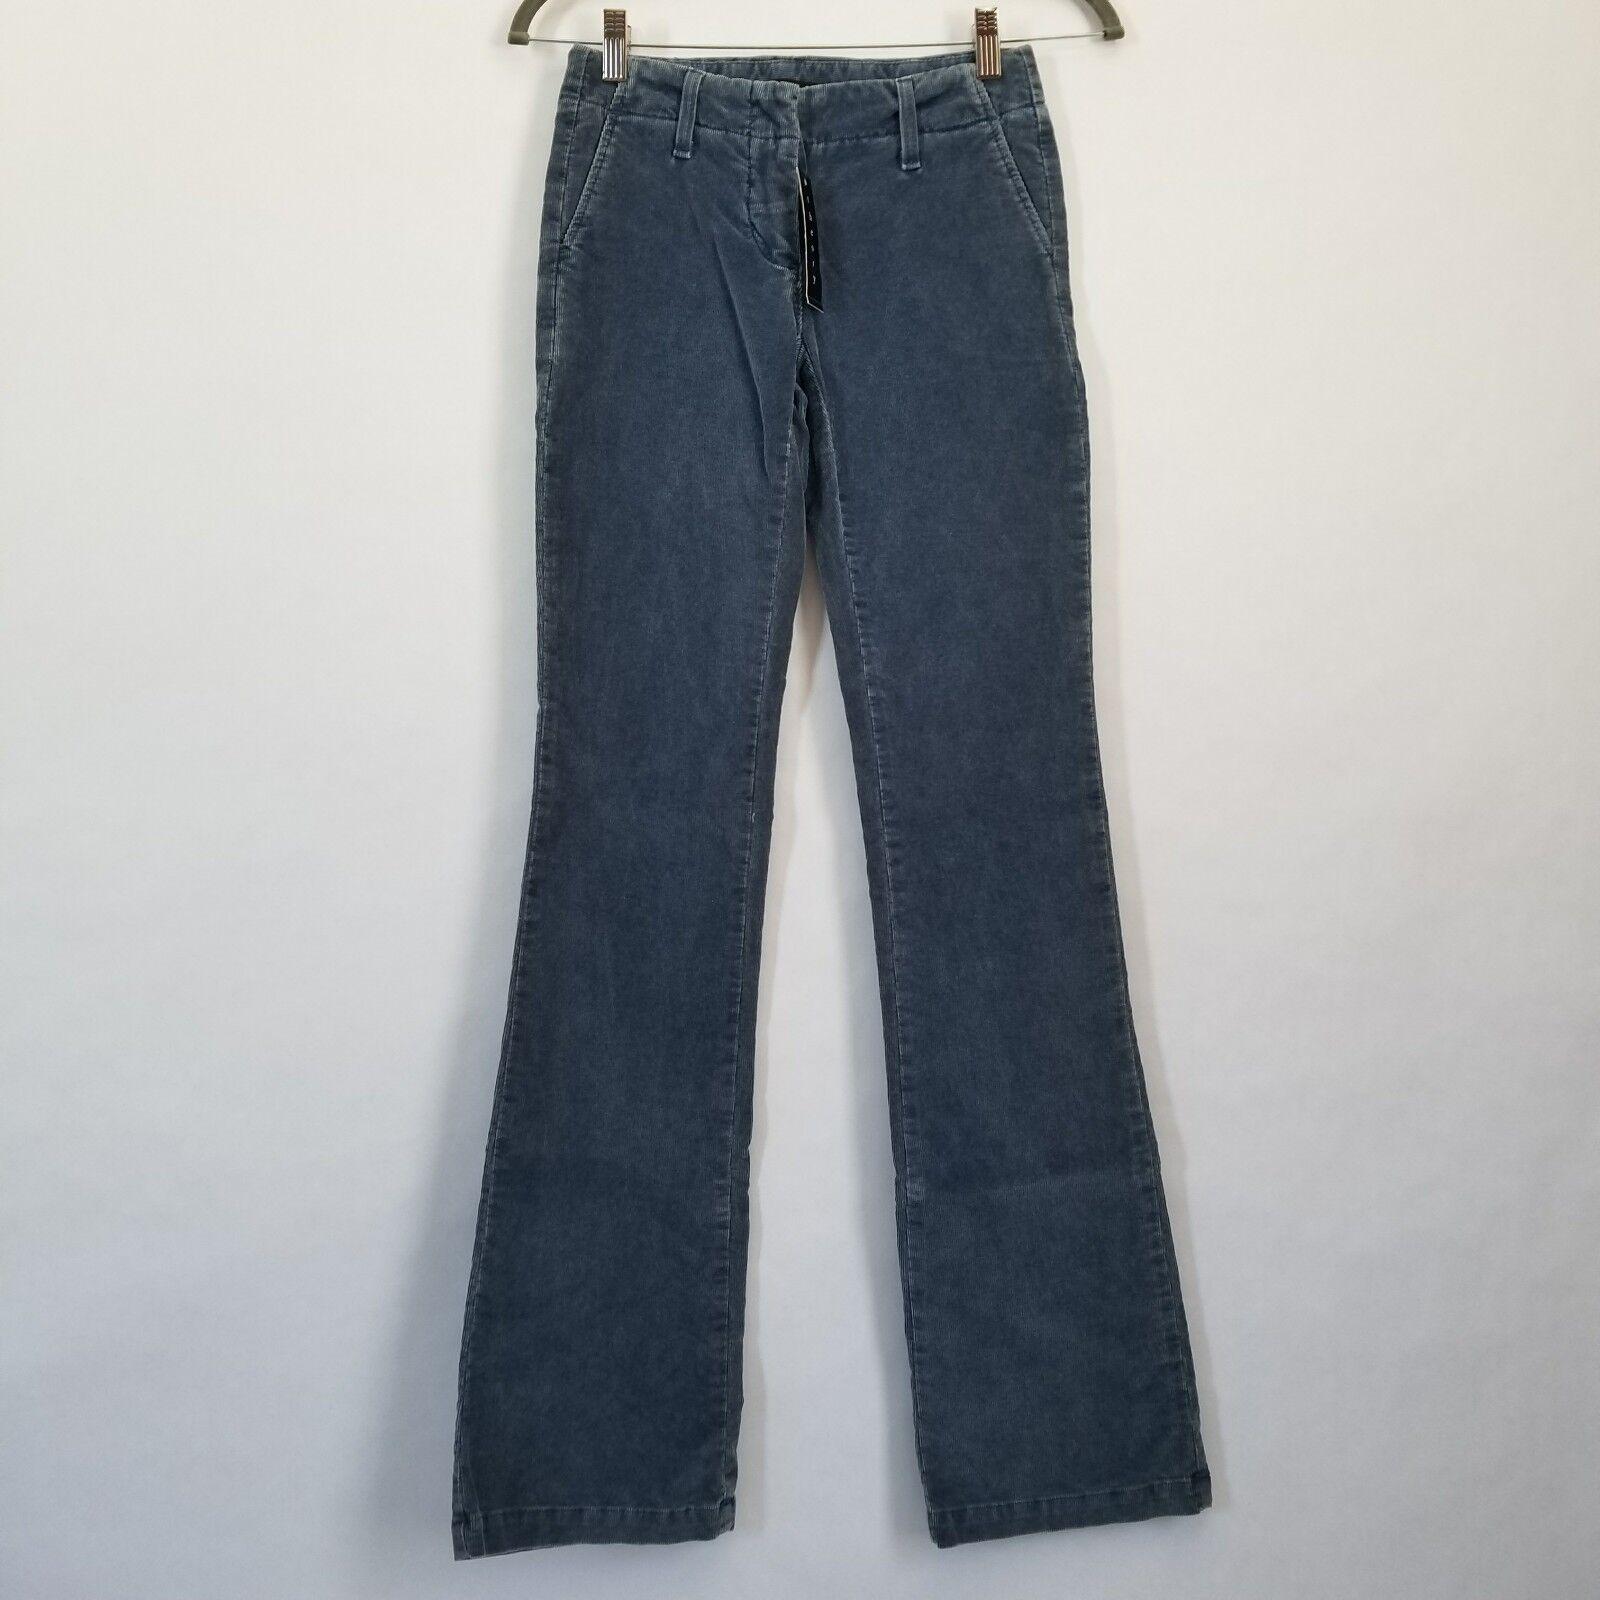 280 NEW Theory SUGAR women size 00 faded bluee corduroy flare pants waist 26